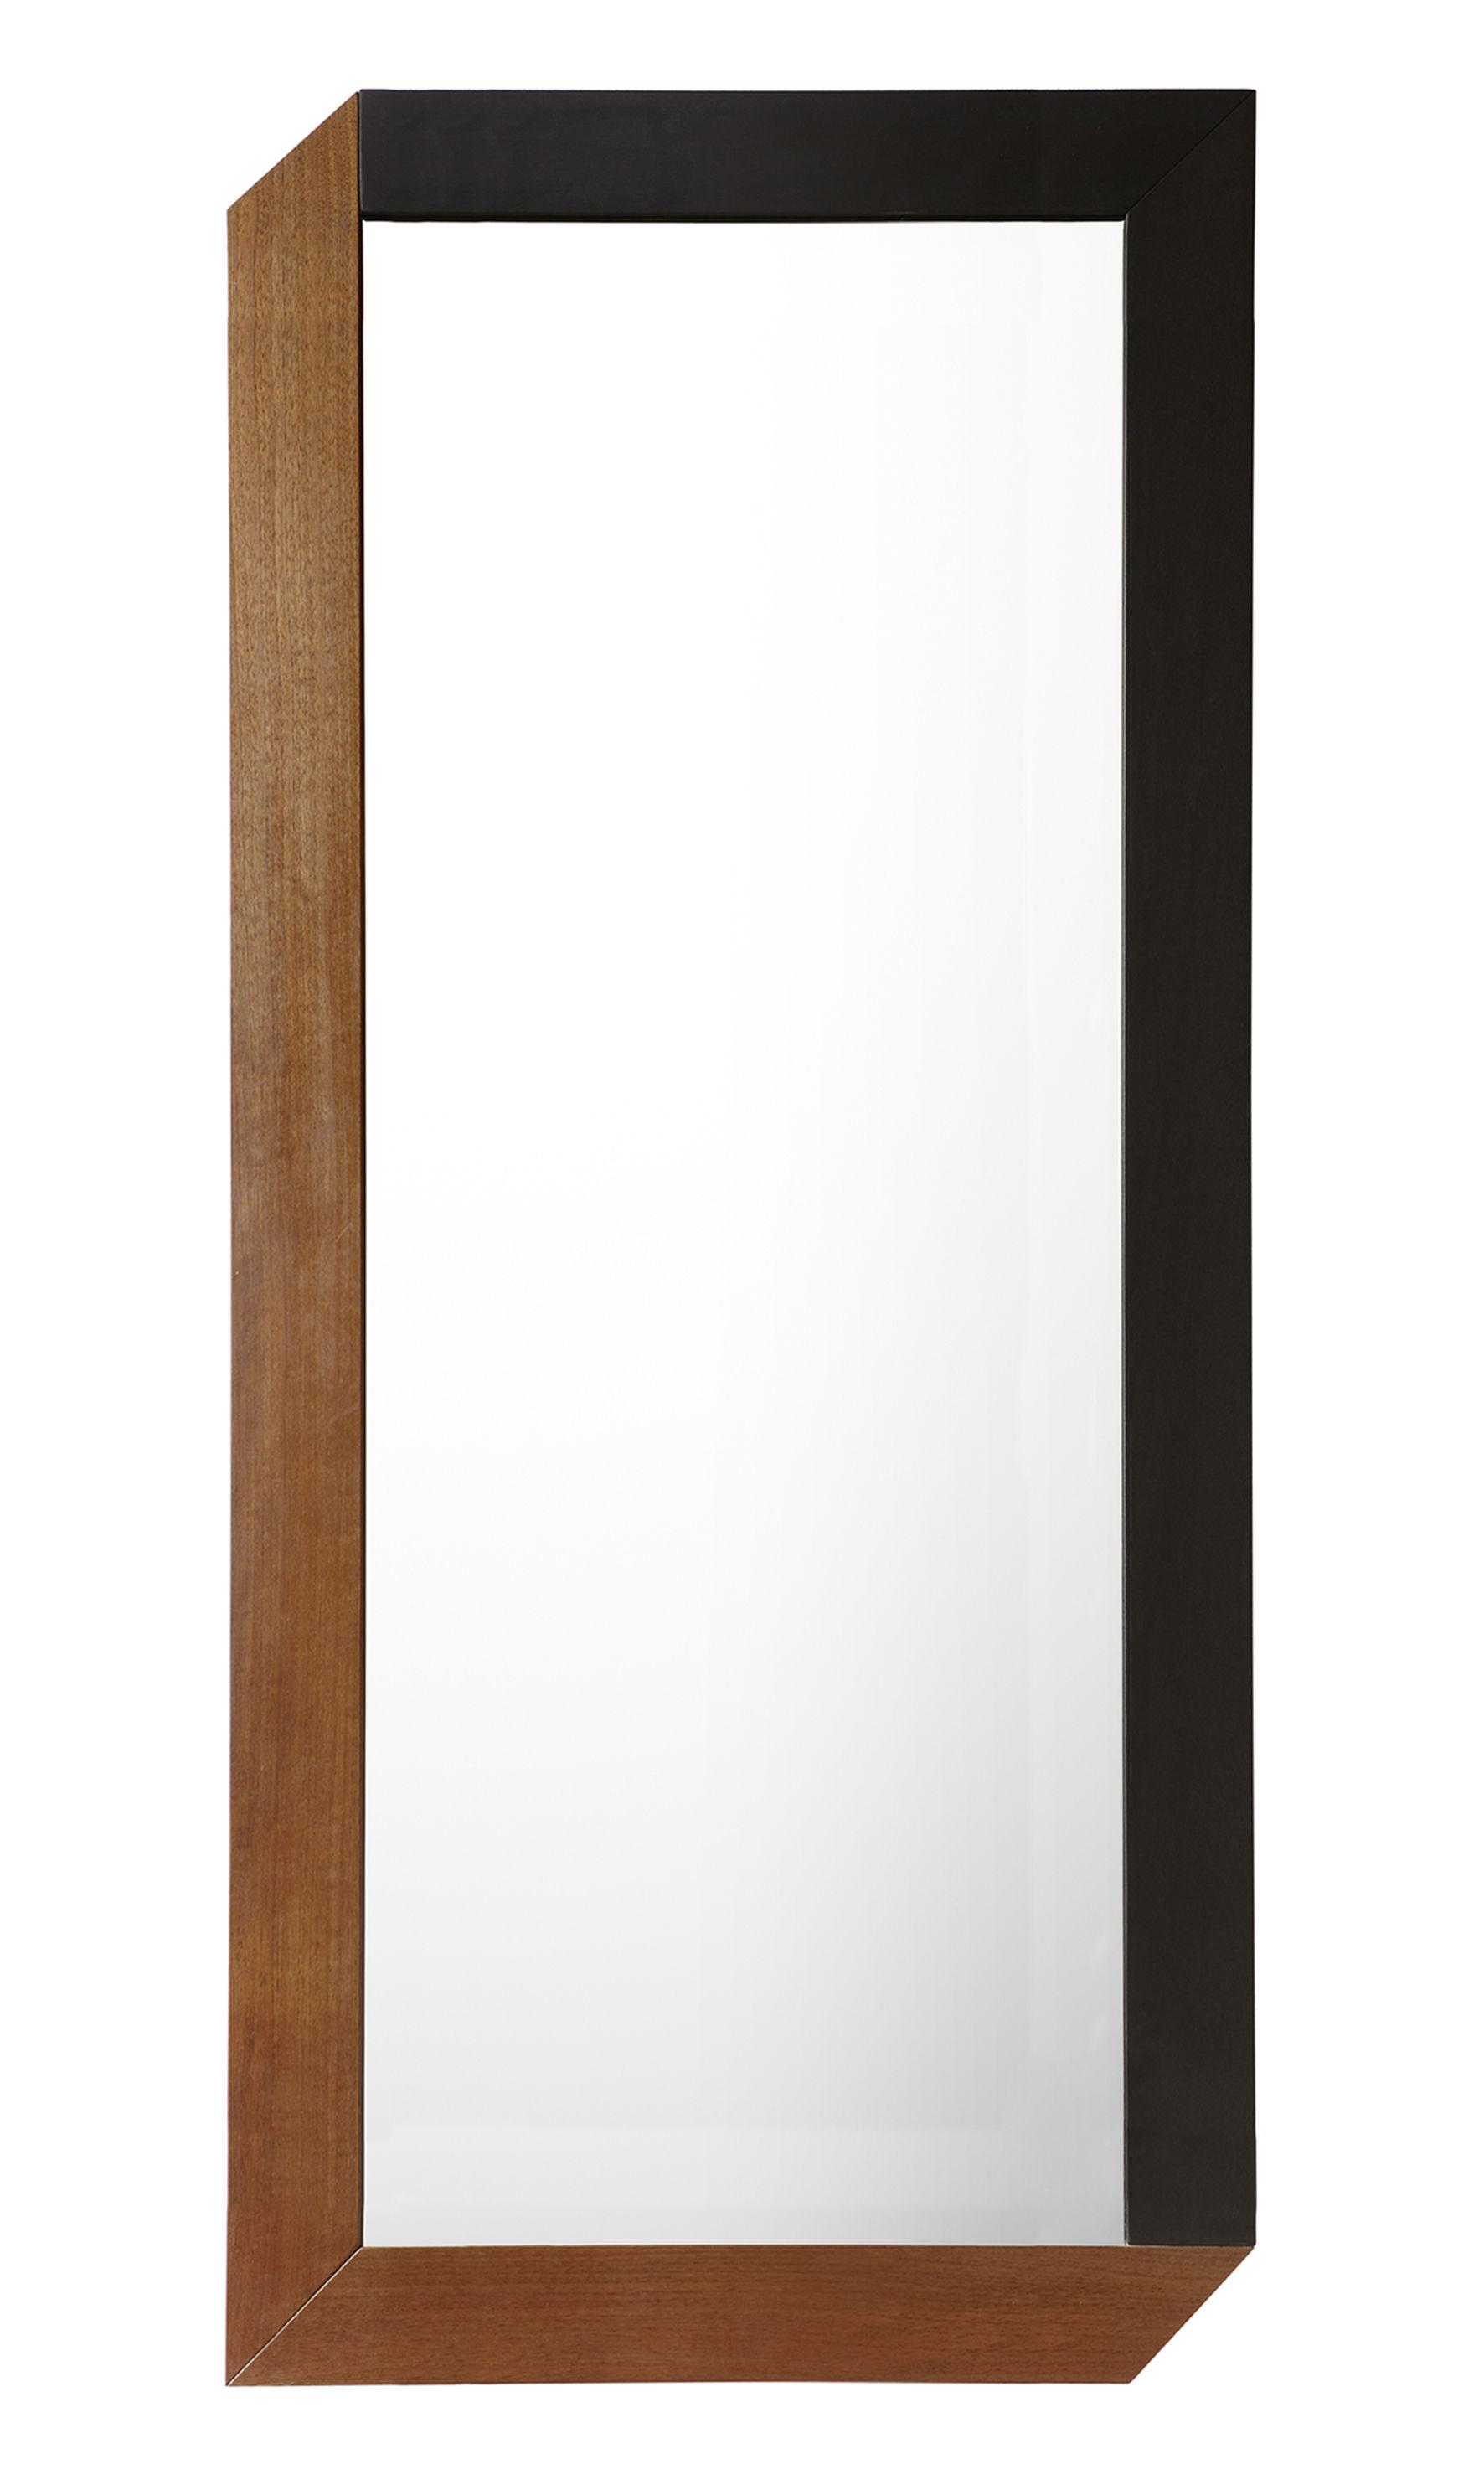 Tusa mirror 90 cm x 40 cm h 90 cm by internoitaliano for Miroir 90x90